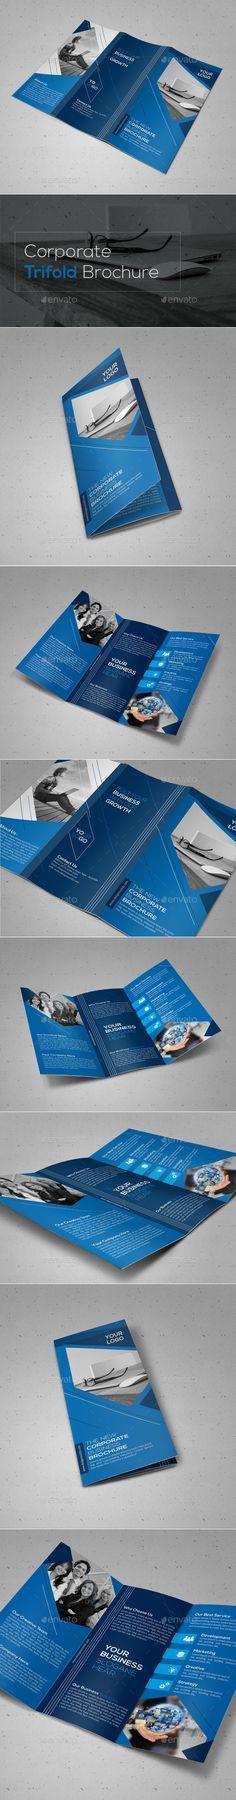 Corporate Tri Fold Brochure Template Psd Design Download Http